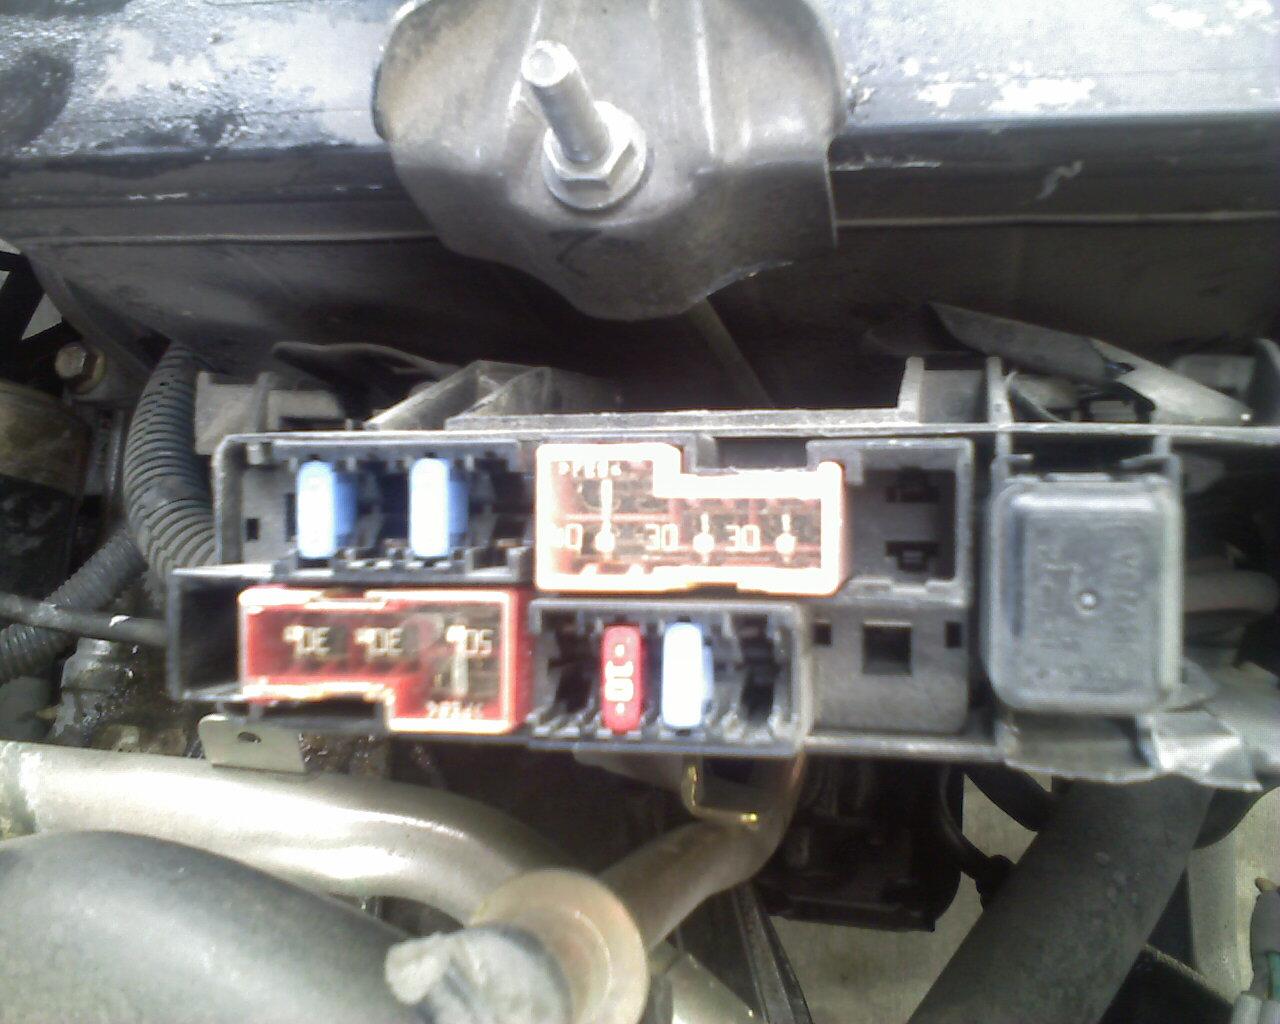 2006 nissan altima automatic sp  no electronicas   lights 2014 nissan armada wiring-diagram 2014 nissan armada wiring-diagram 2014 nissan armada wiring-diagram 2014 nissan armada wiring-diagram